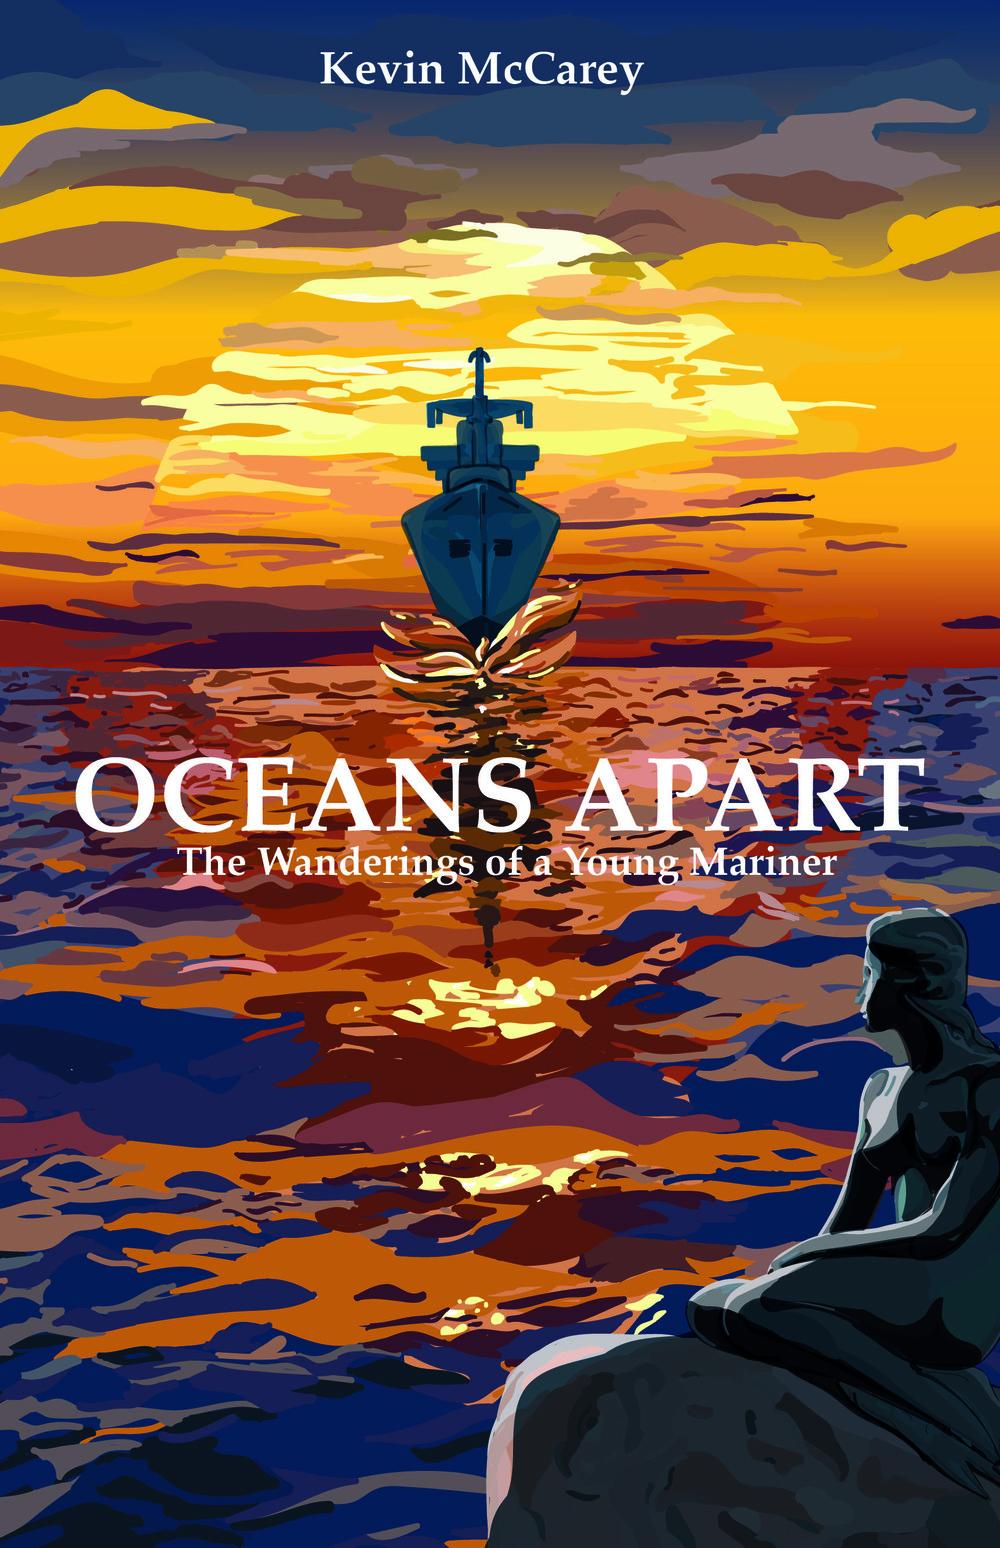 Book Cover (Oceans Apart)